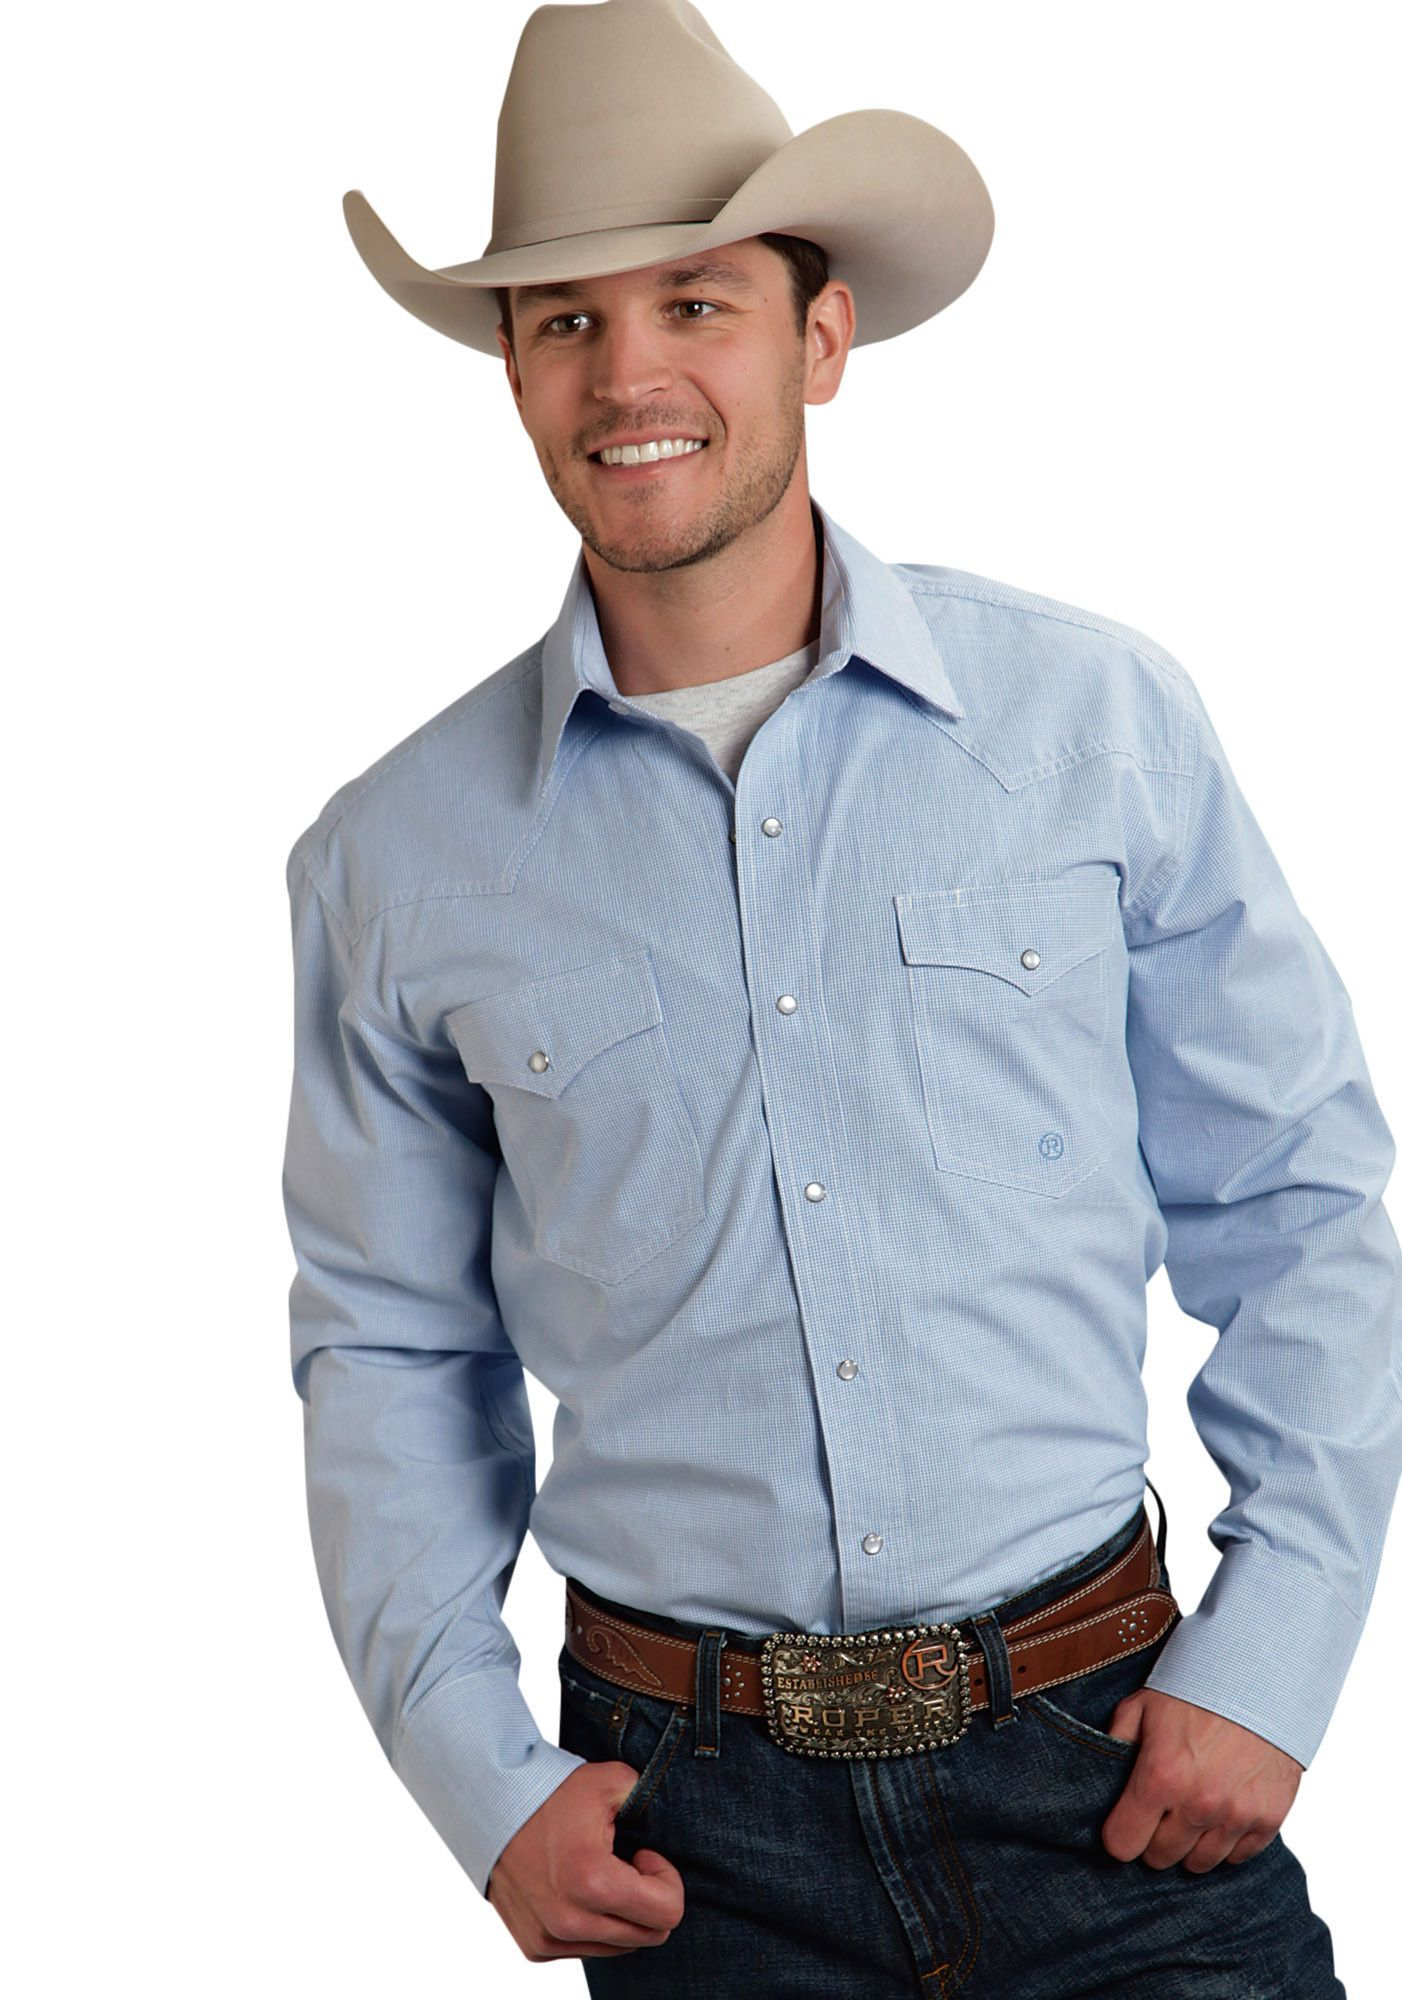 38583d6acb Roper Mens 9596 Mini Checks - Blue Amarillo Blue Horizon Long Sleeve Shirt  Snap Closure - 2 Pocket